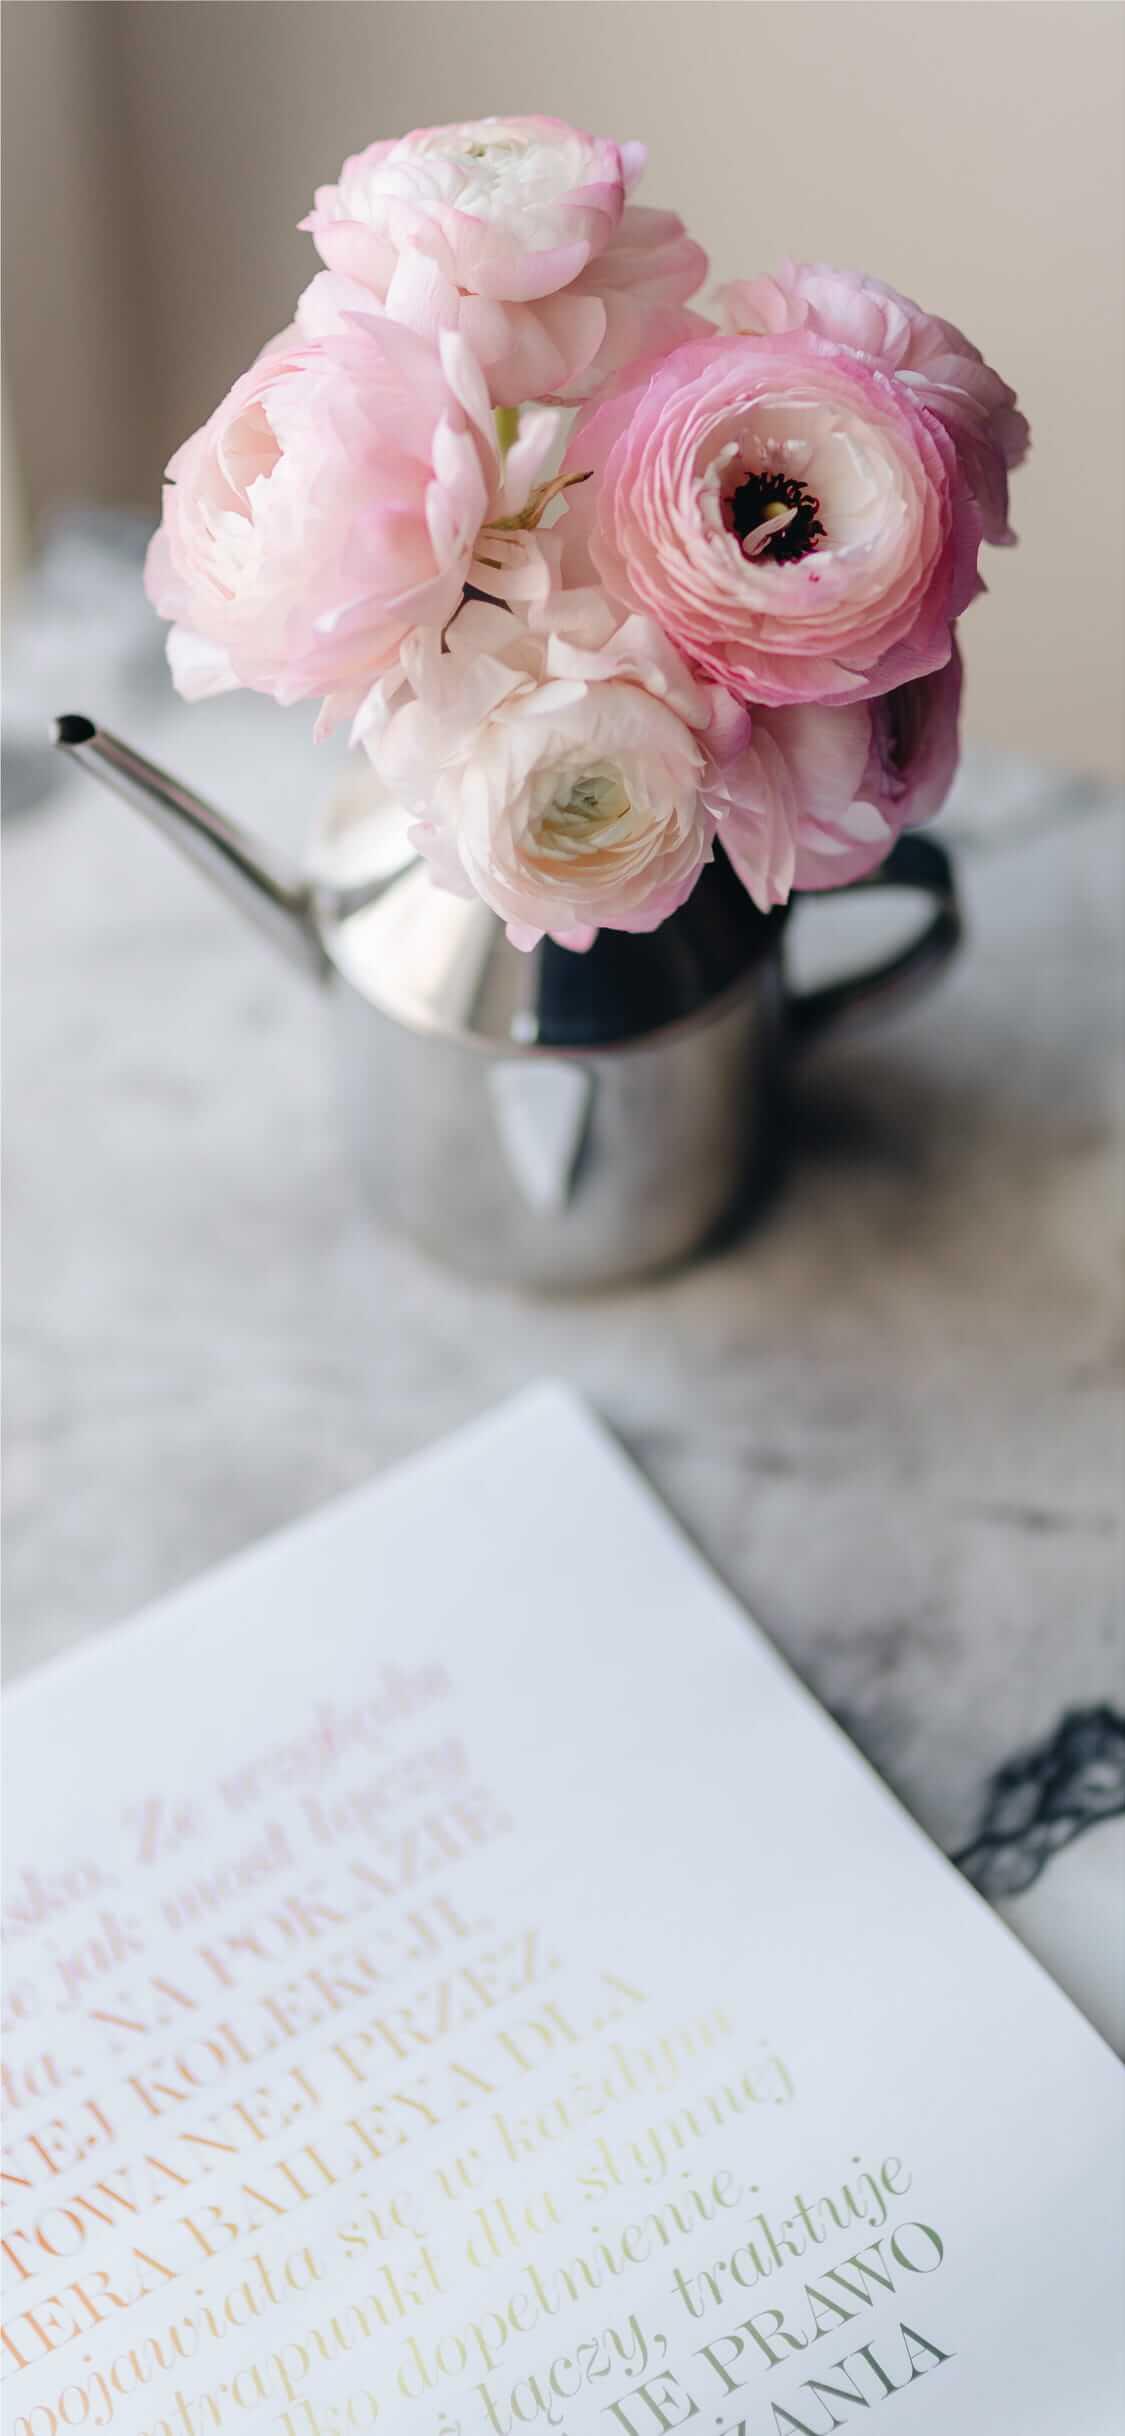 Iphone11pro Iphonexsの壁紙をシンプルな花の高画質写真に Time Fun Fun